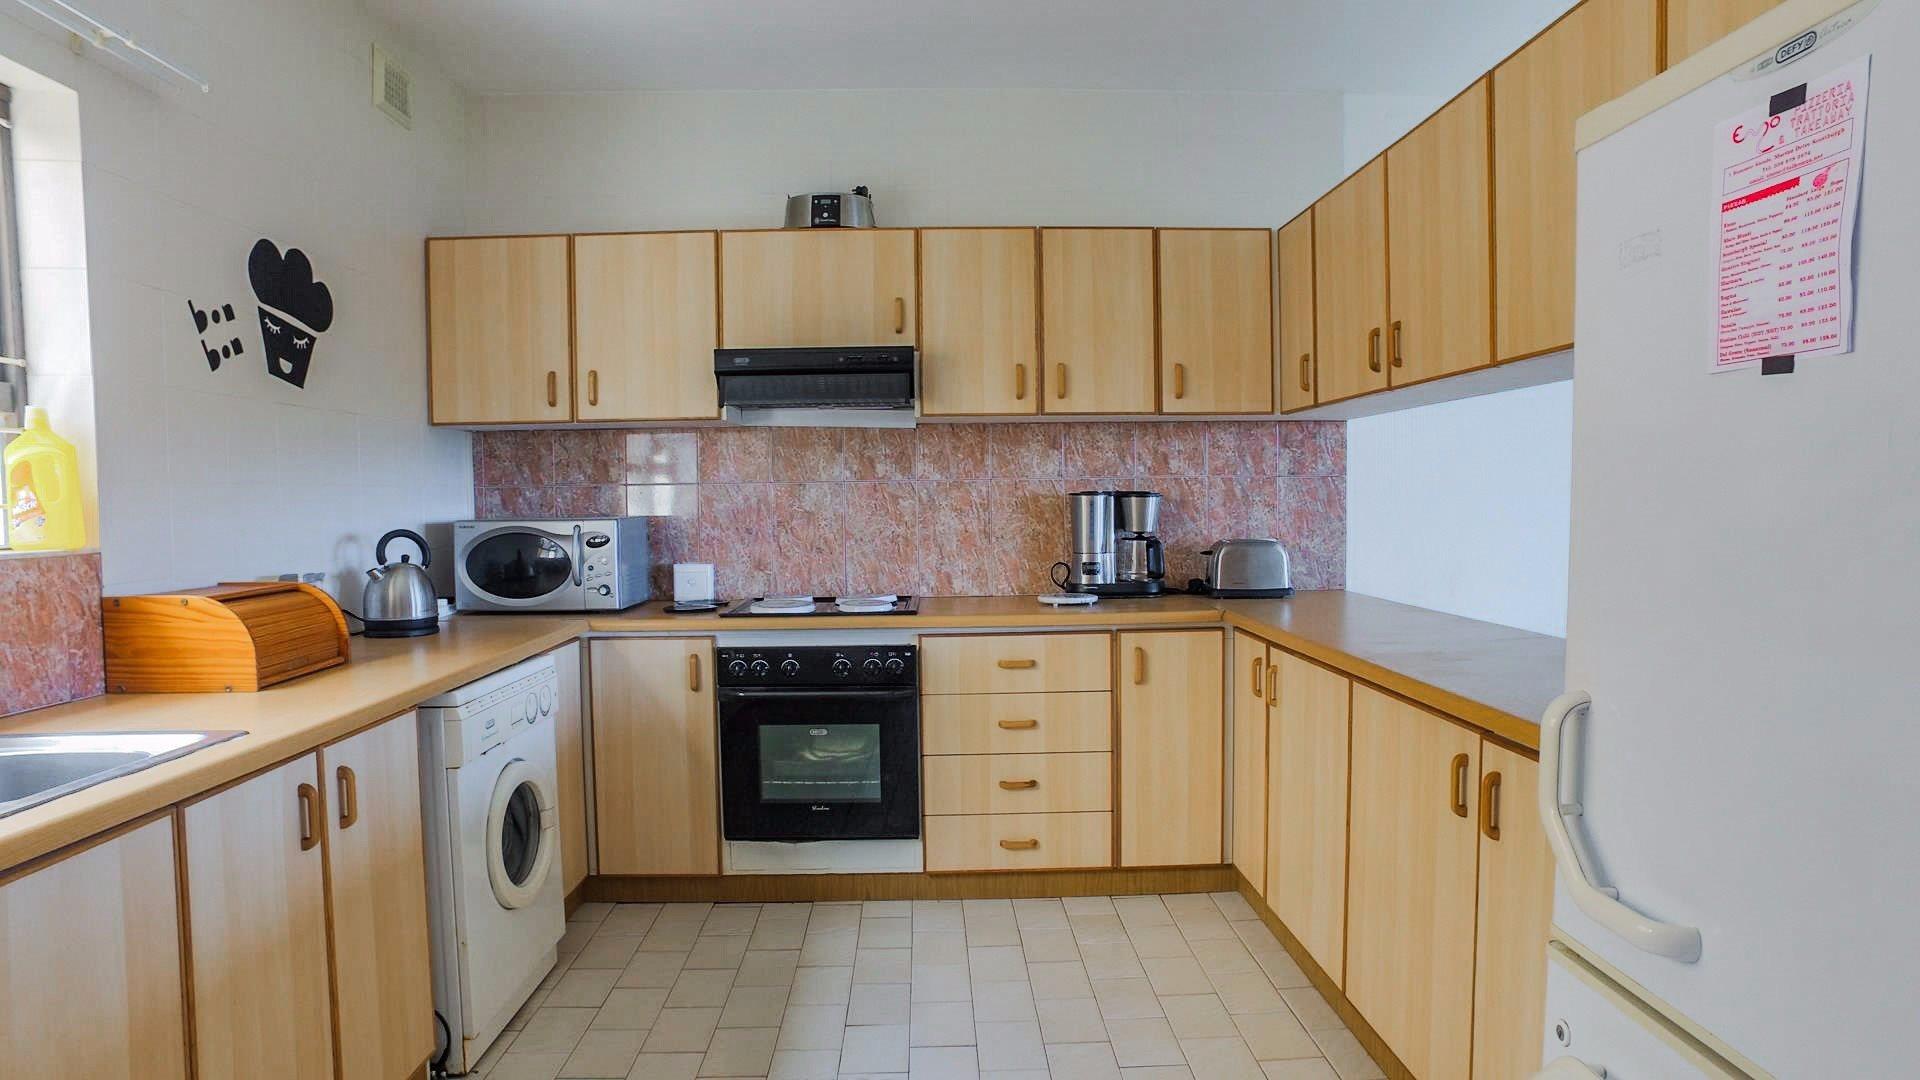 Scottburgh Central property for sale. Ref No: 13520906. Picture no 10